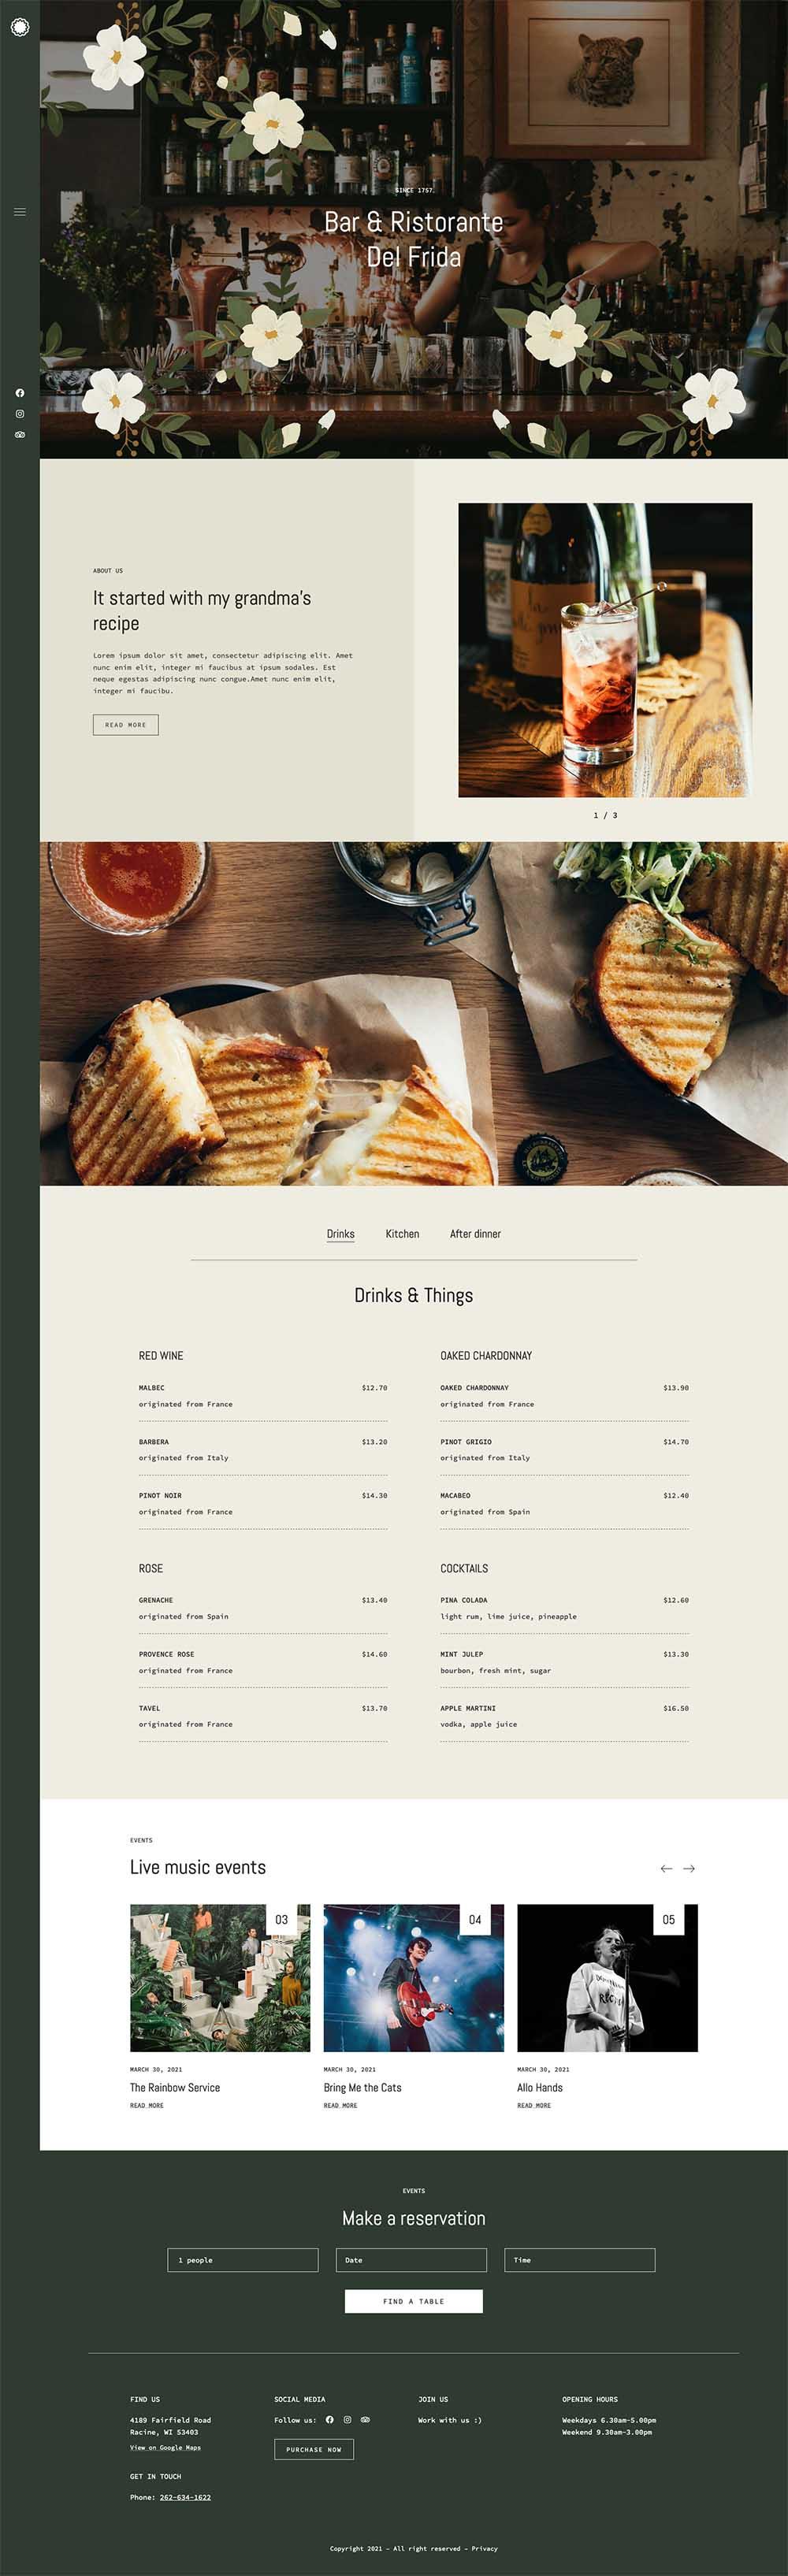 Frida Bar – Food & Restaurant Demo Website for WordPress